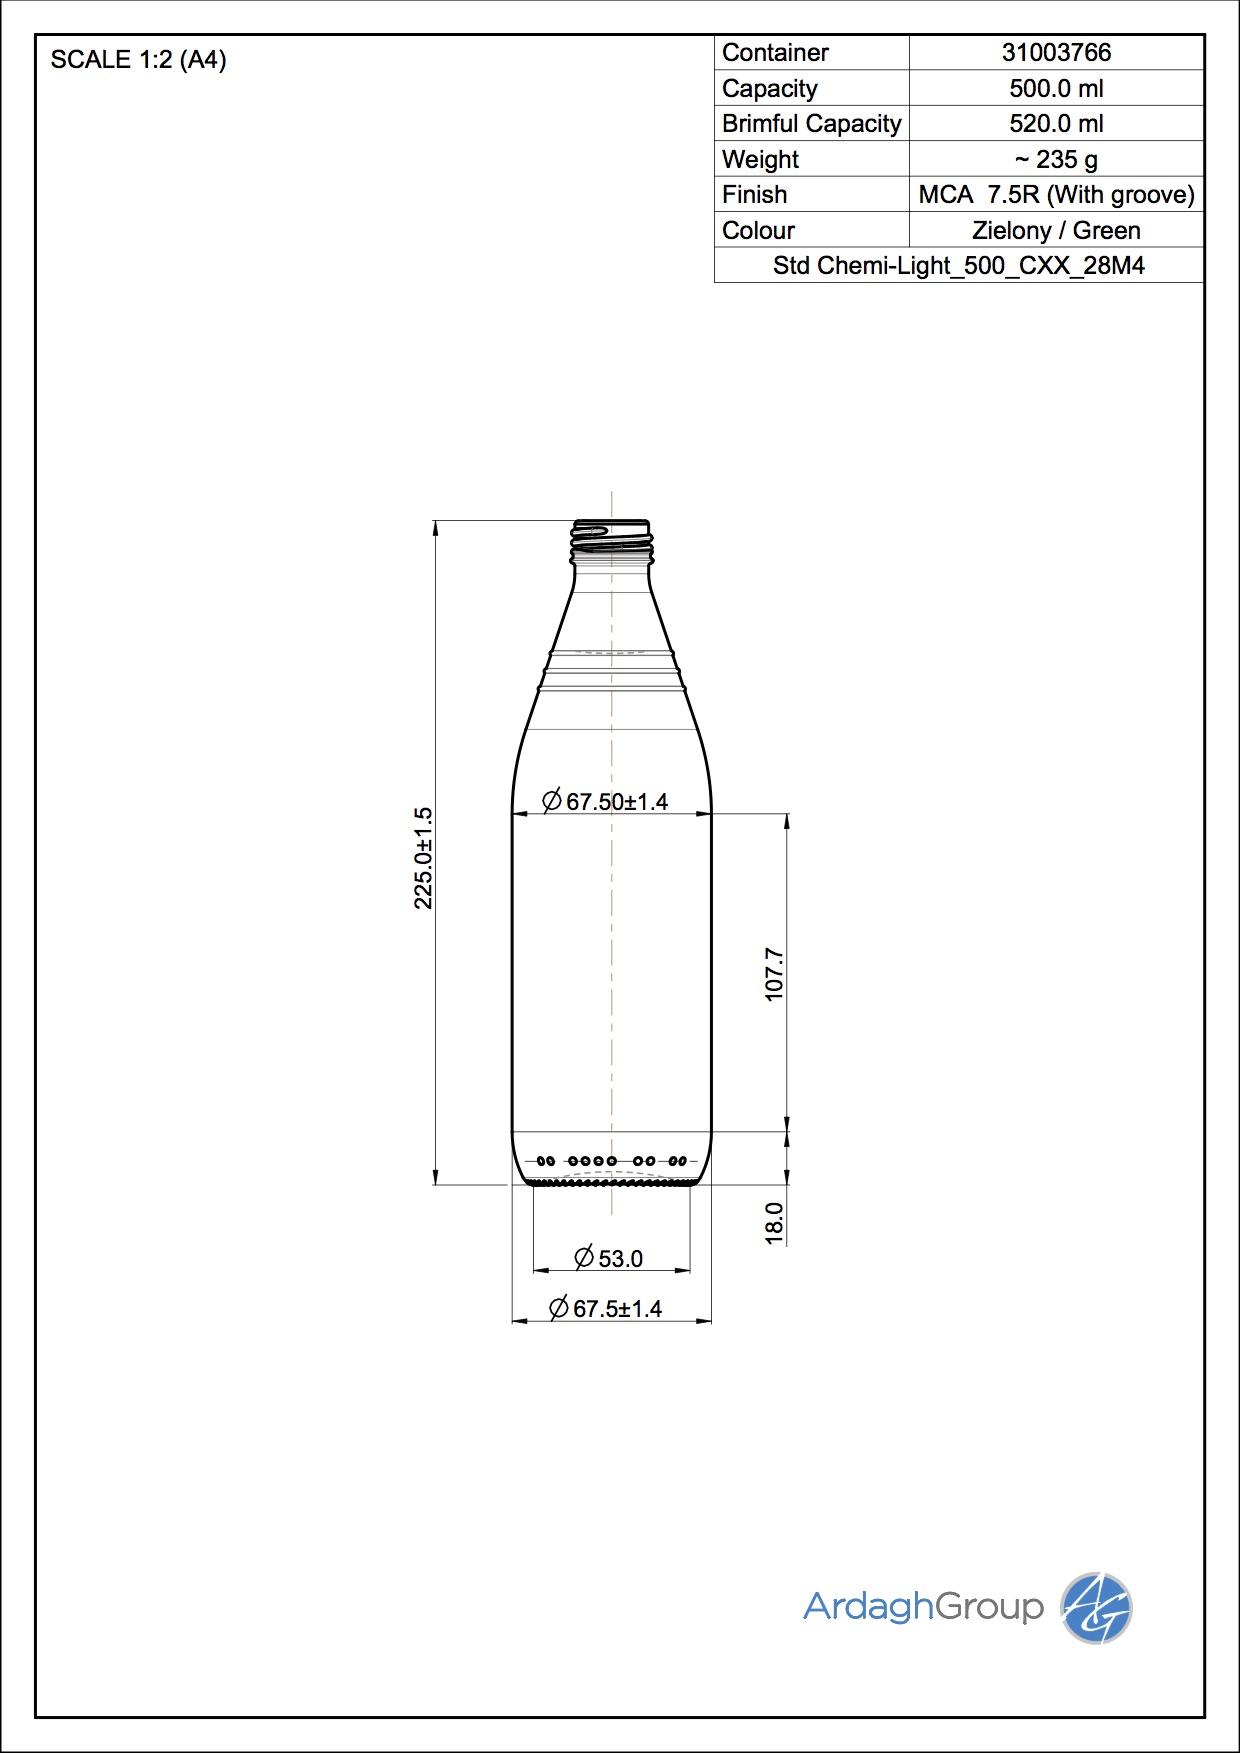 Std Chemi-Light 500 CXX 28M4